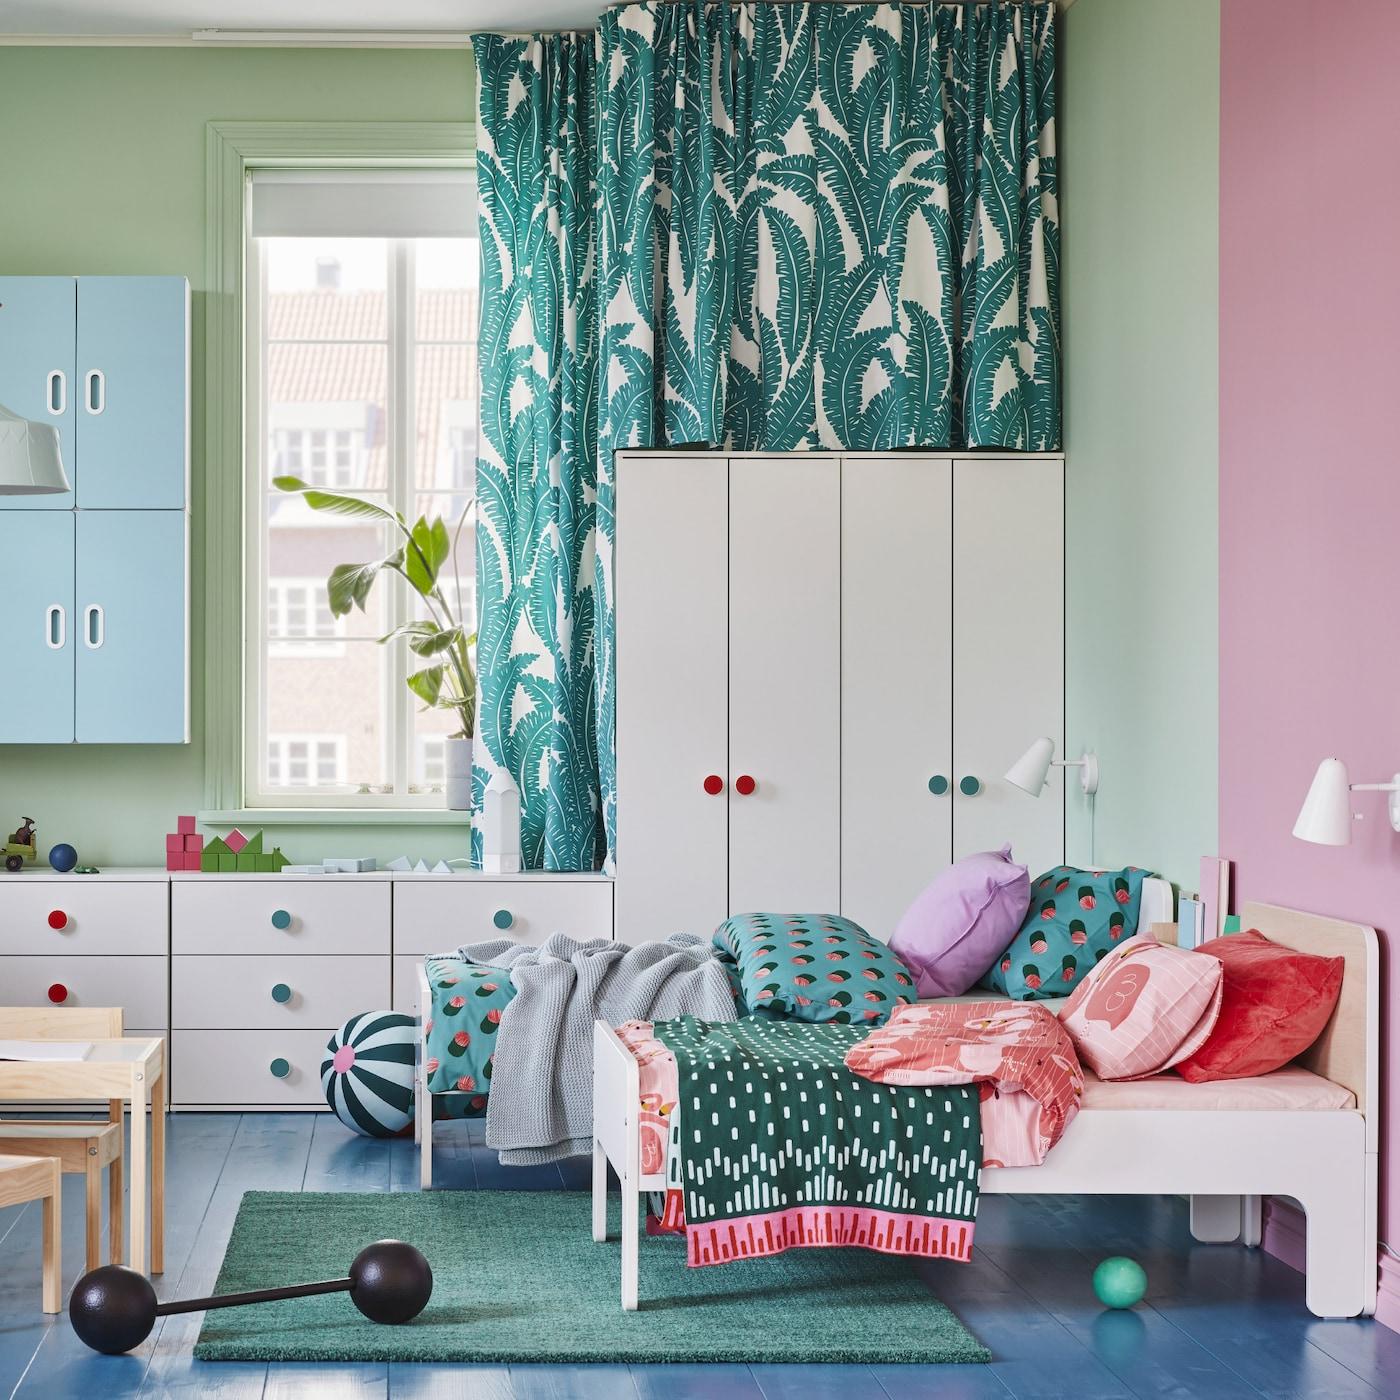 Dečja soba s belim garderoberima i komodama, dva produživa krevetna okvira, zelenim tepihom i plavim zidnim ormarićima.